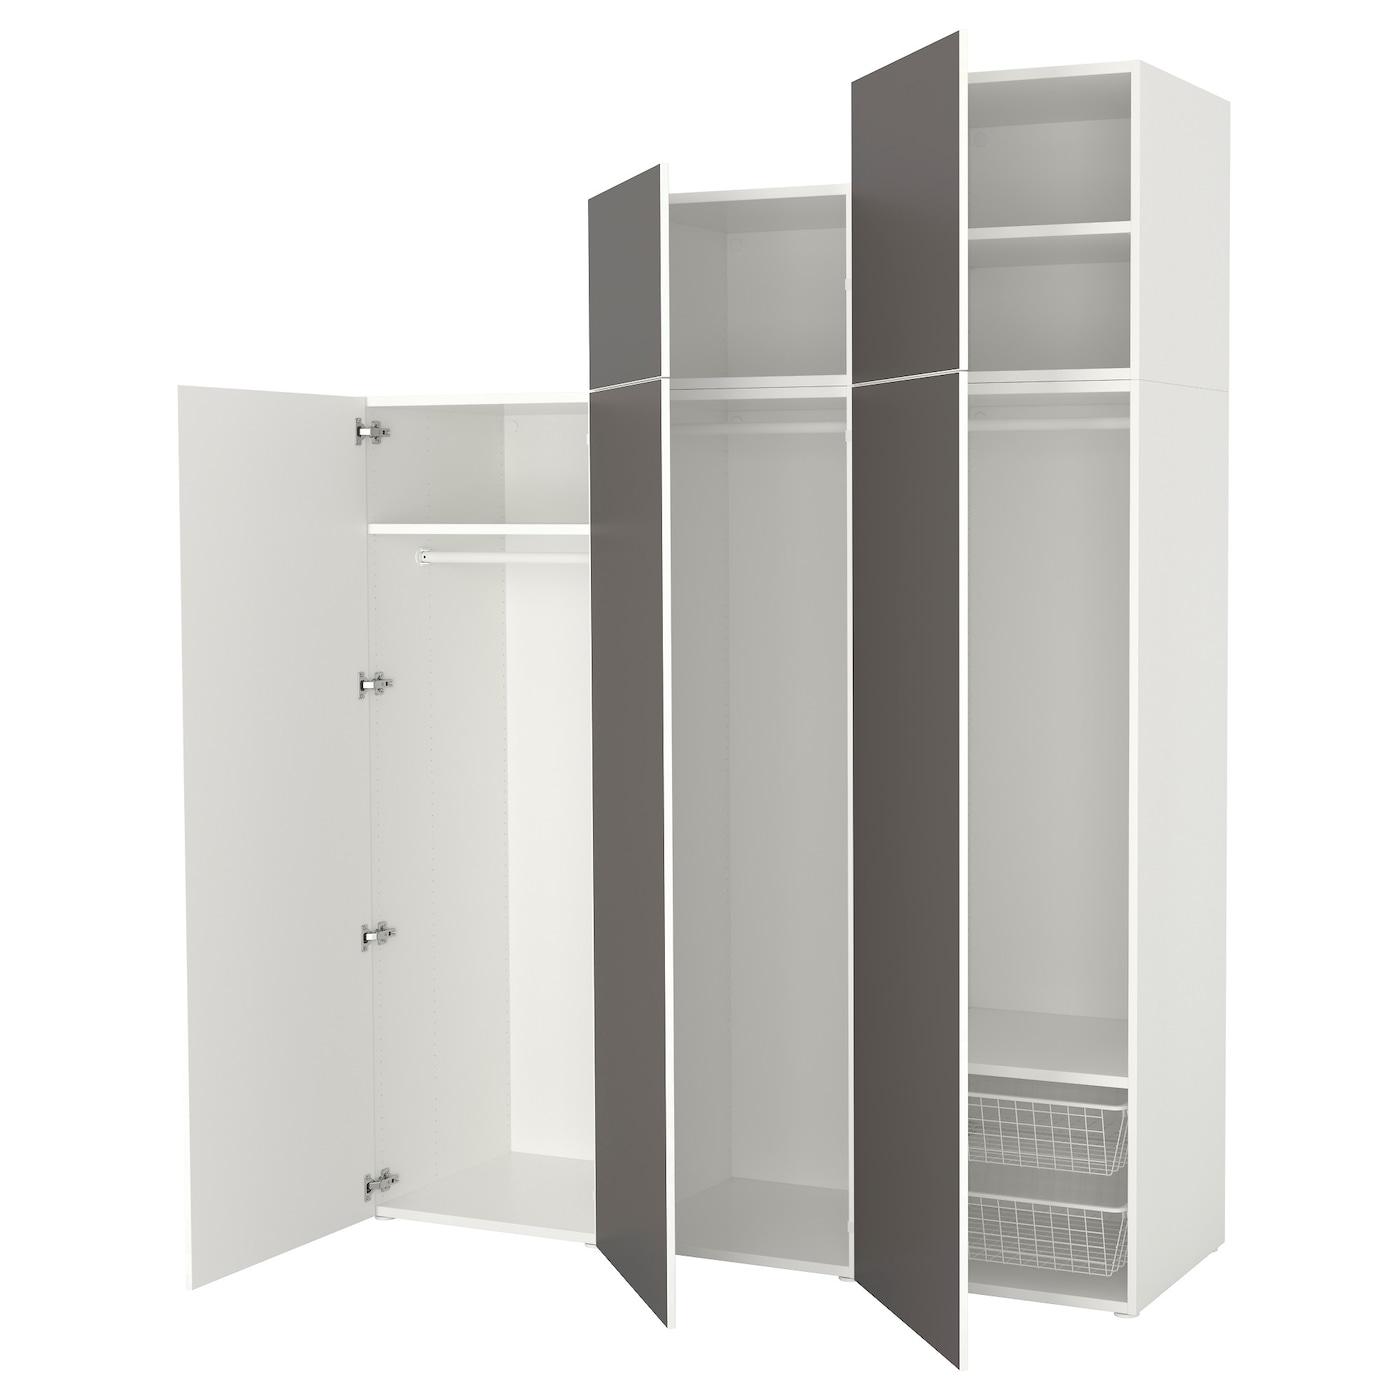 Platsa Wardrobe White Skatval Dark Grey Ikea Switzerland